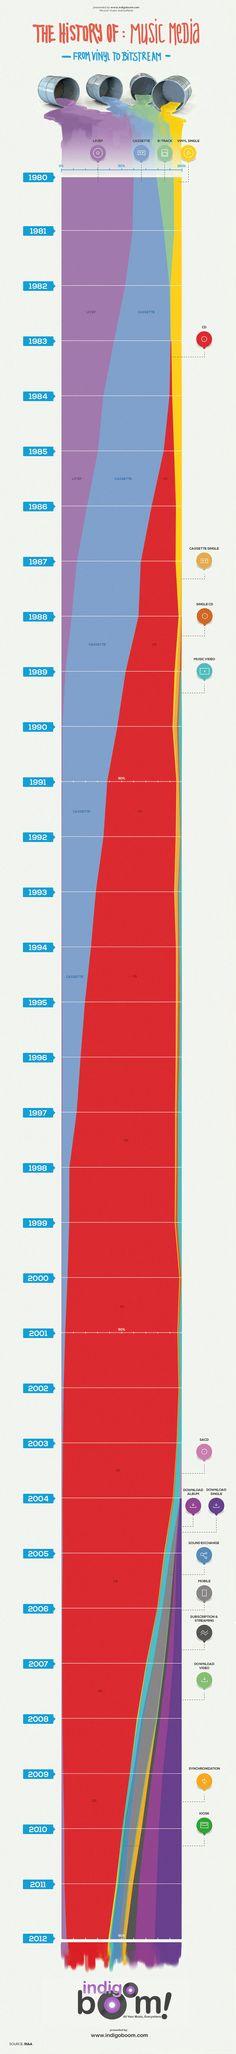 Historia de los soportes de música #infografia #infographic